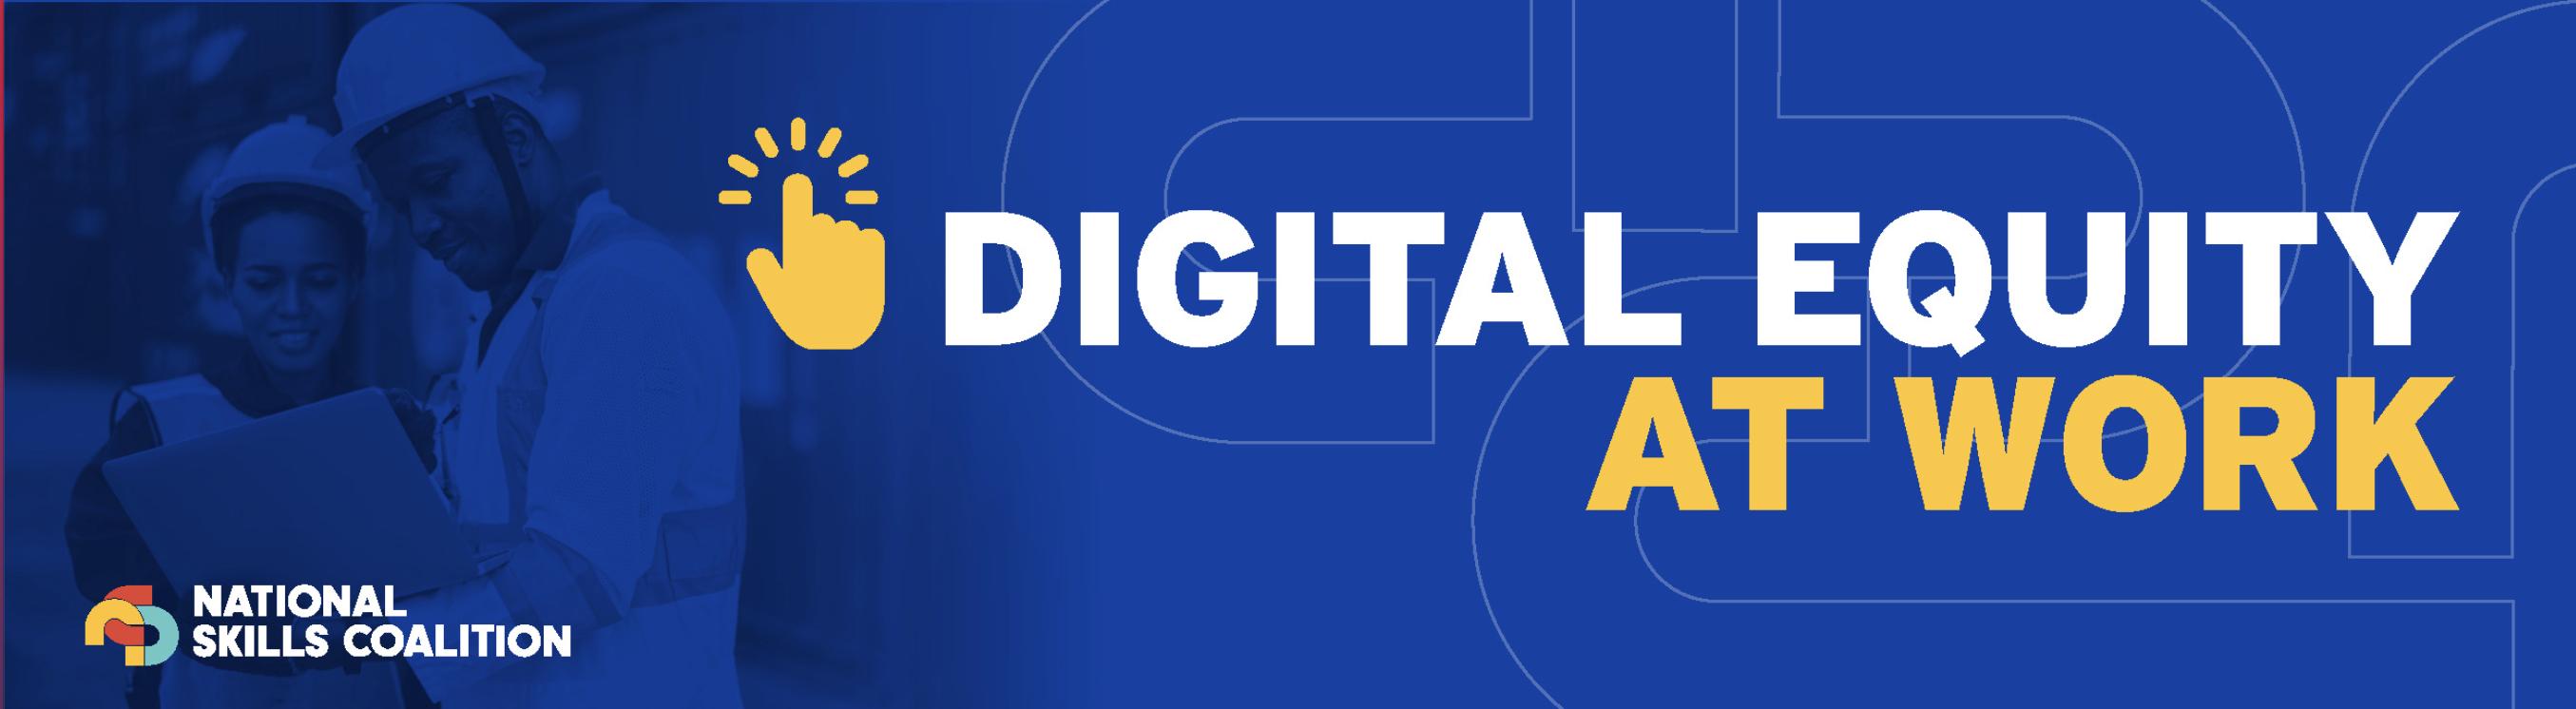 Digital Equity at Work Flyer